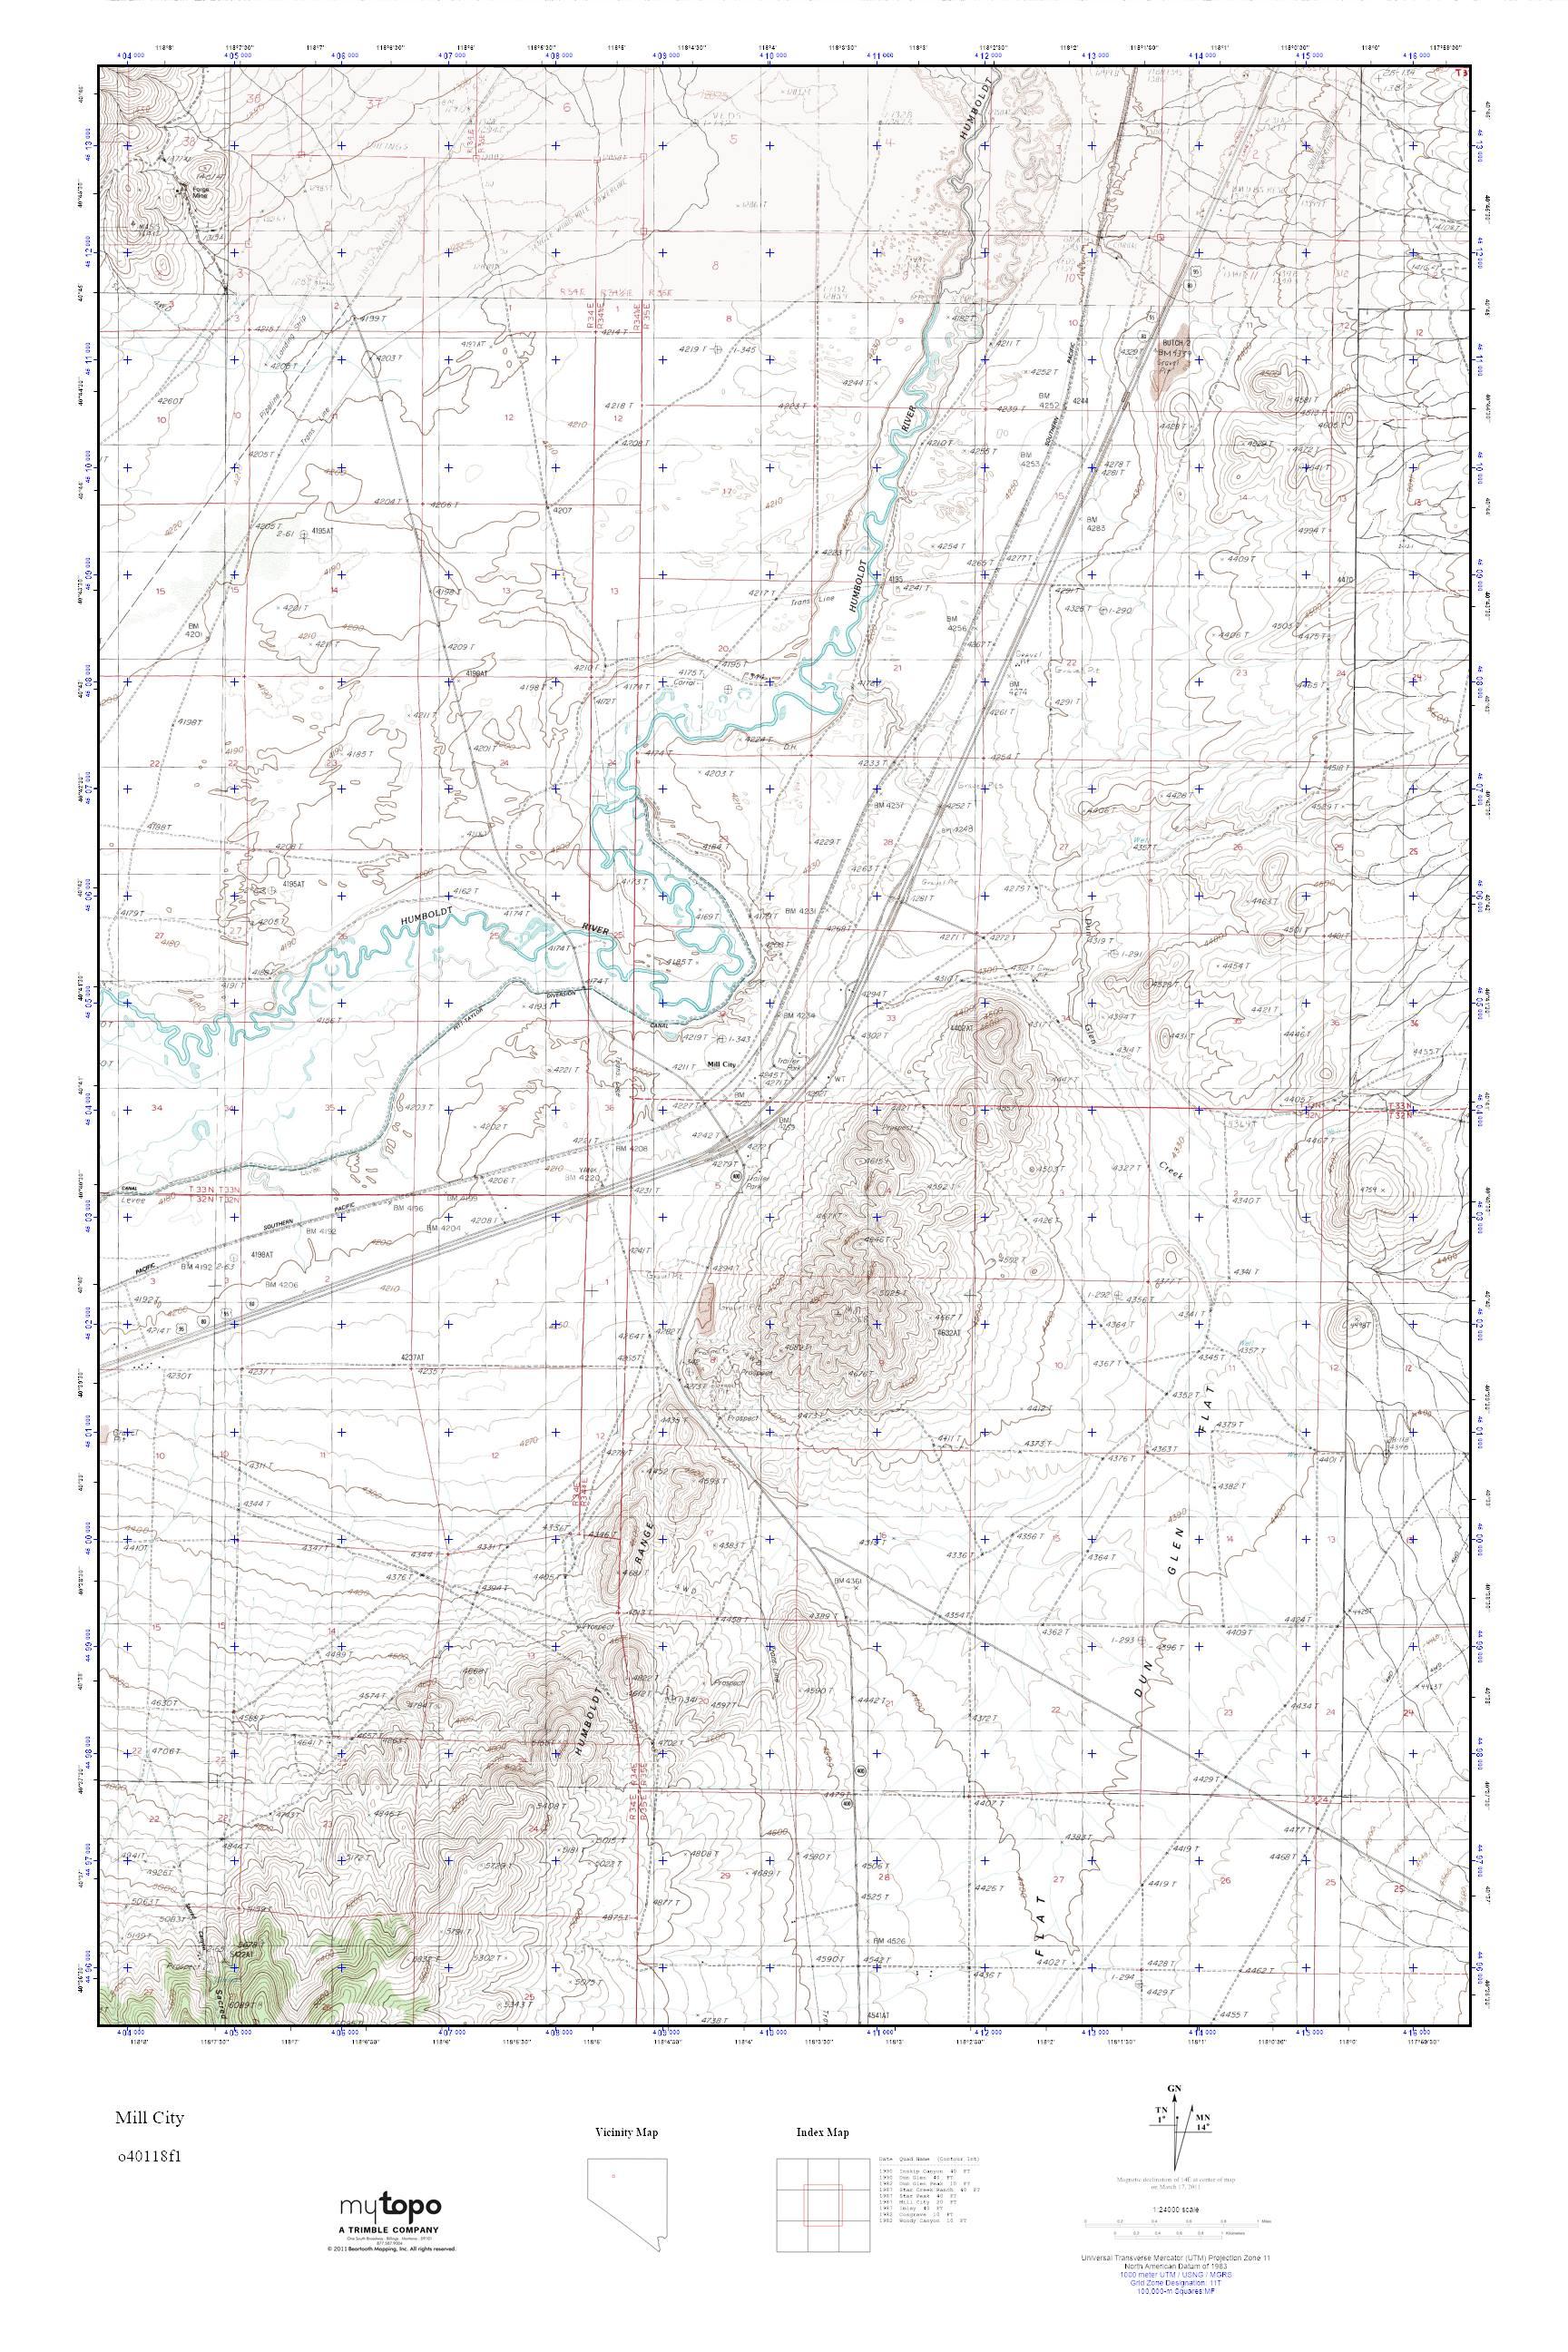 MyTopo Mill City, Nevada USGS Quad Topo Map